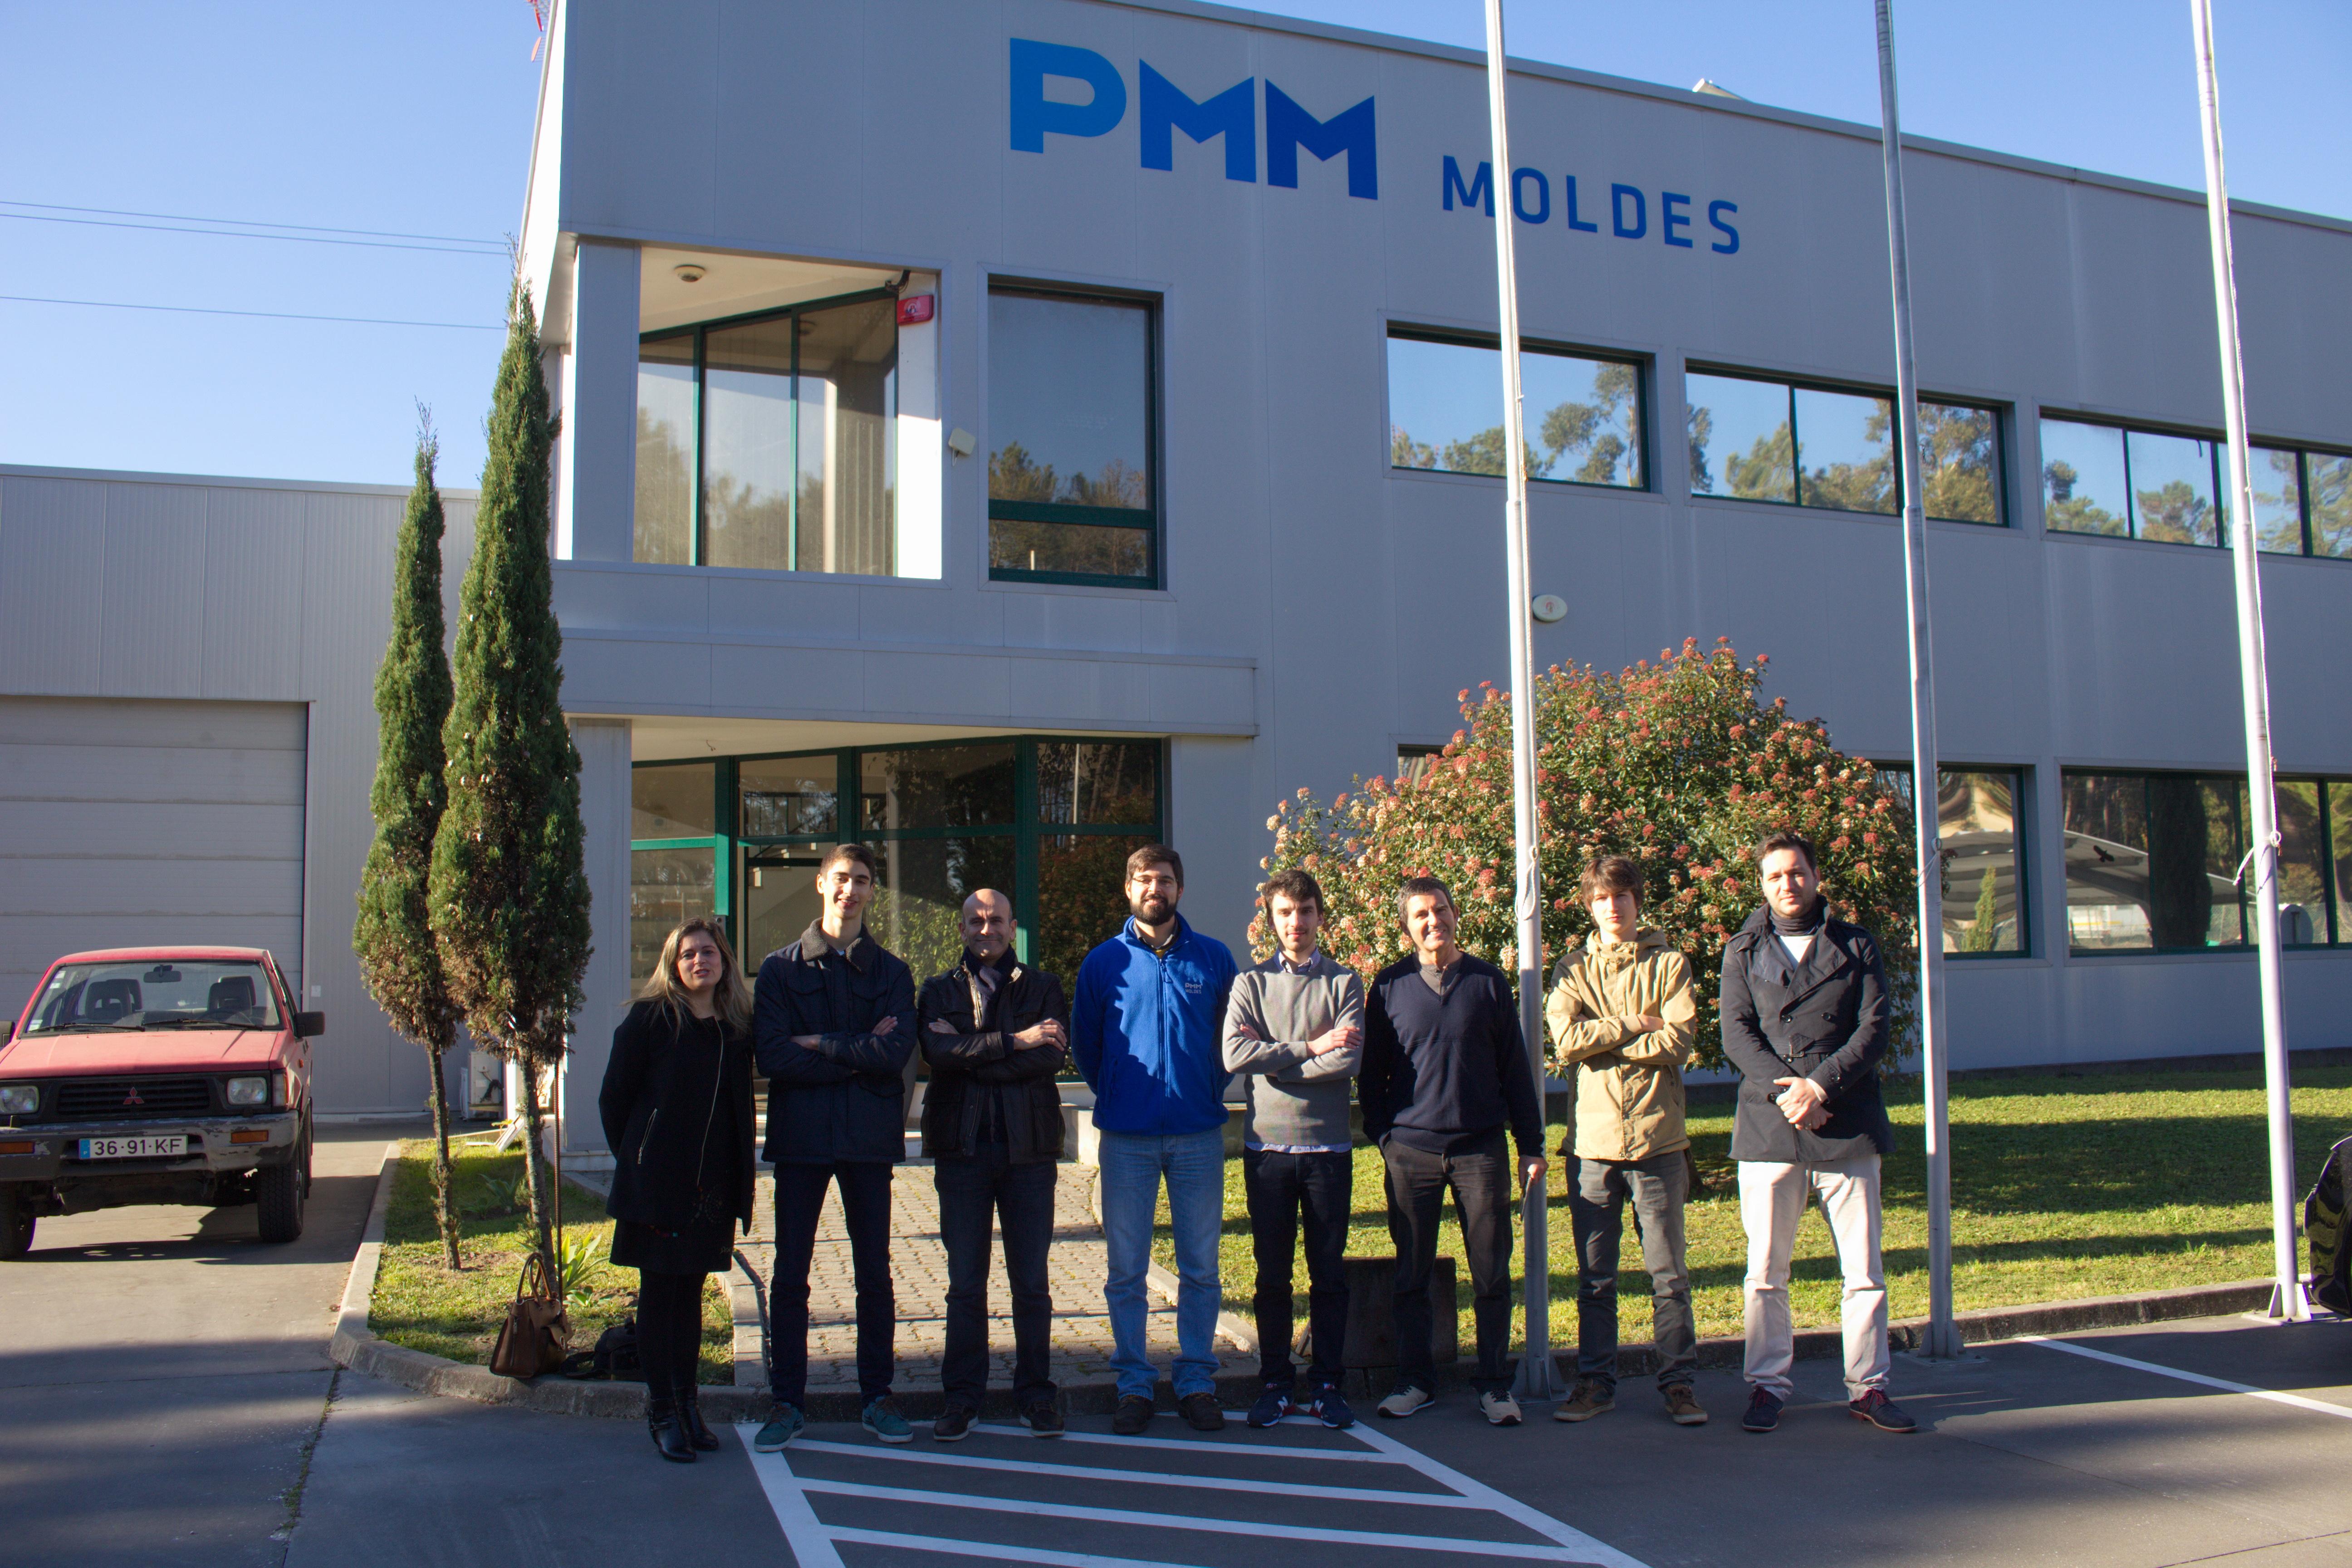 Visita à empresa PMM Moldes